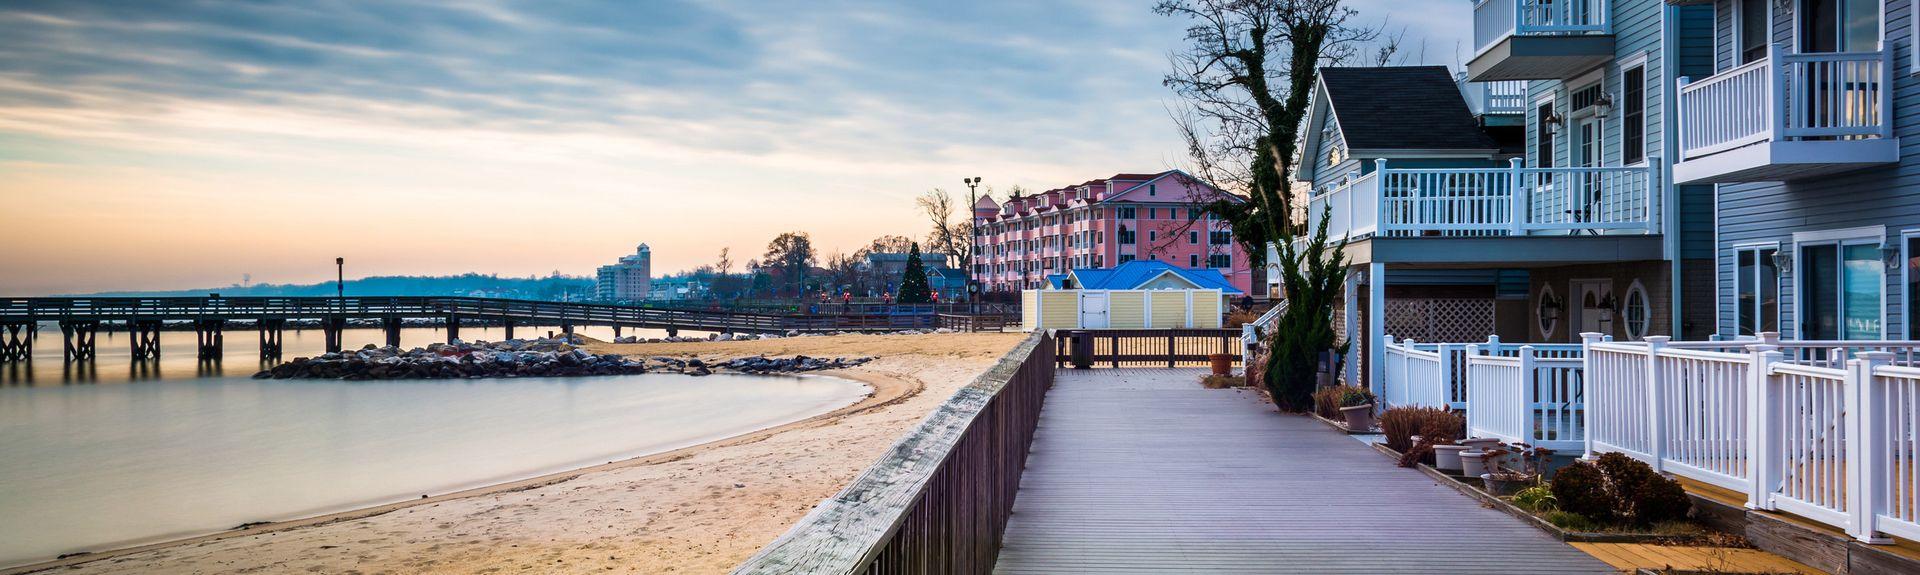 Chesapeake Beach, MD, USA